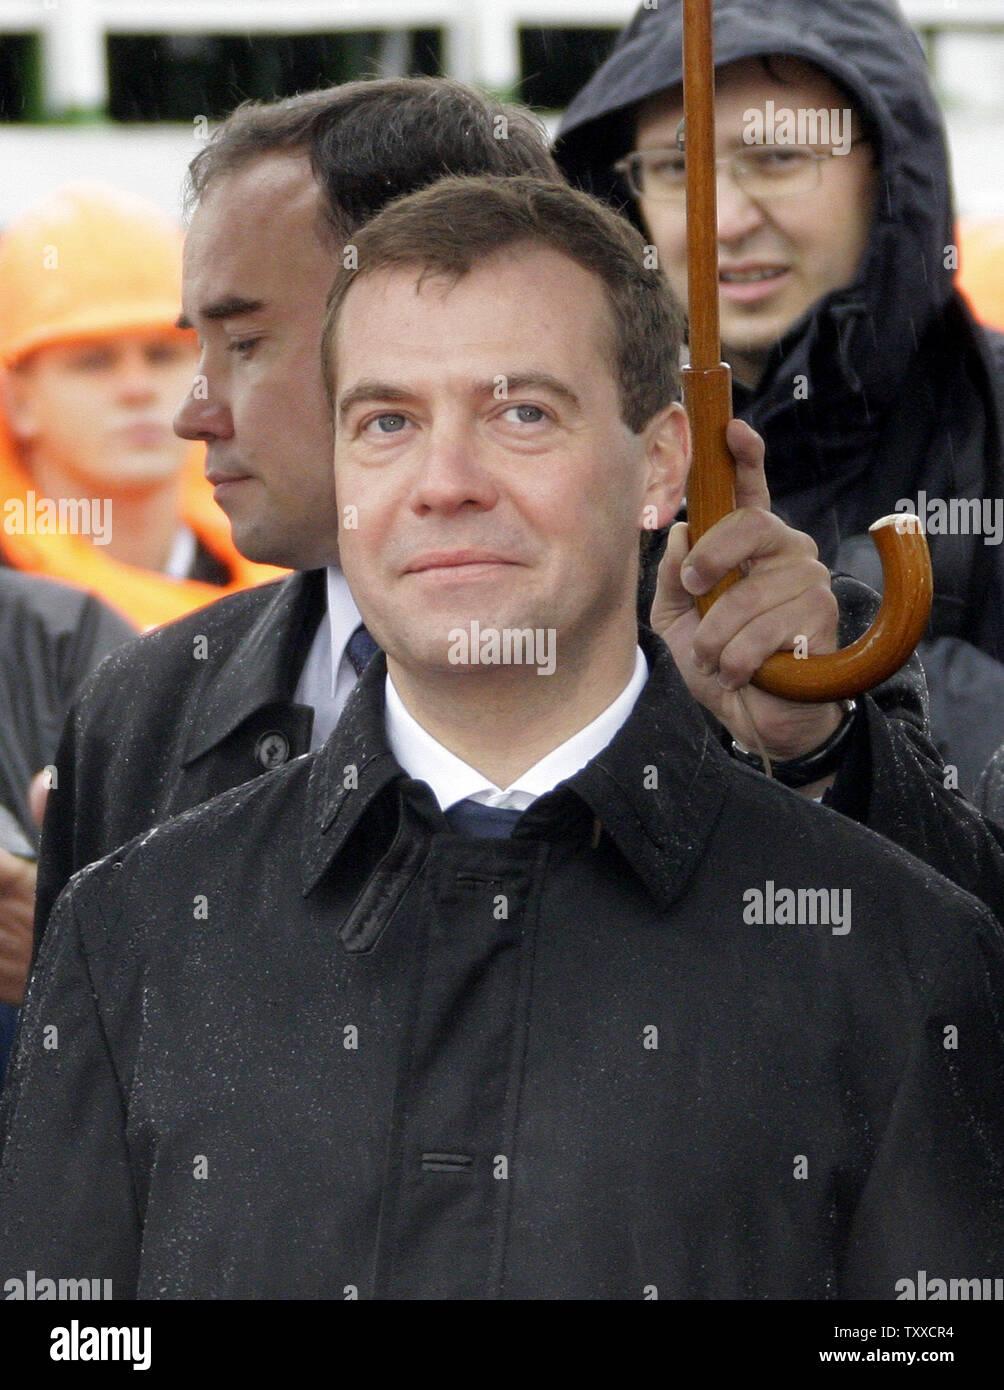 President Dmitry Medvedev visits the 'St. George the Victor' nuclear powered submarine at the Russian Pacific Fleet submarine base at Krasheninnikov Harbor on the Kamchatka Peninsula in the Russian Far East on September 25, 2008. (UPI Photo/Anatoli Zhdanov) - Stock Image